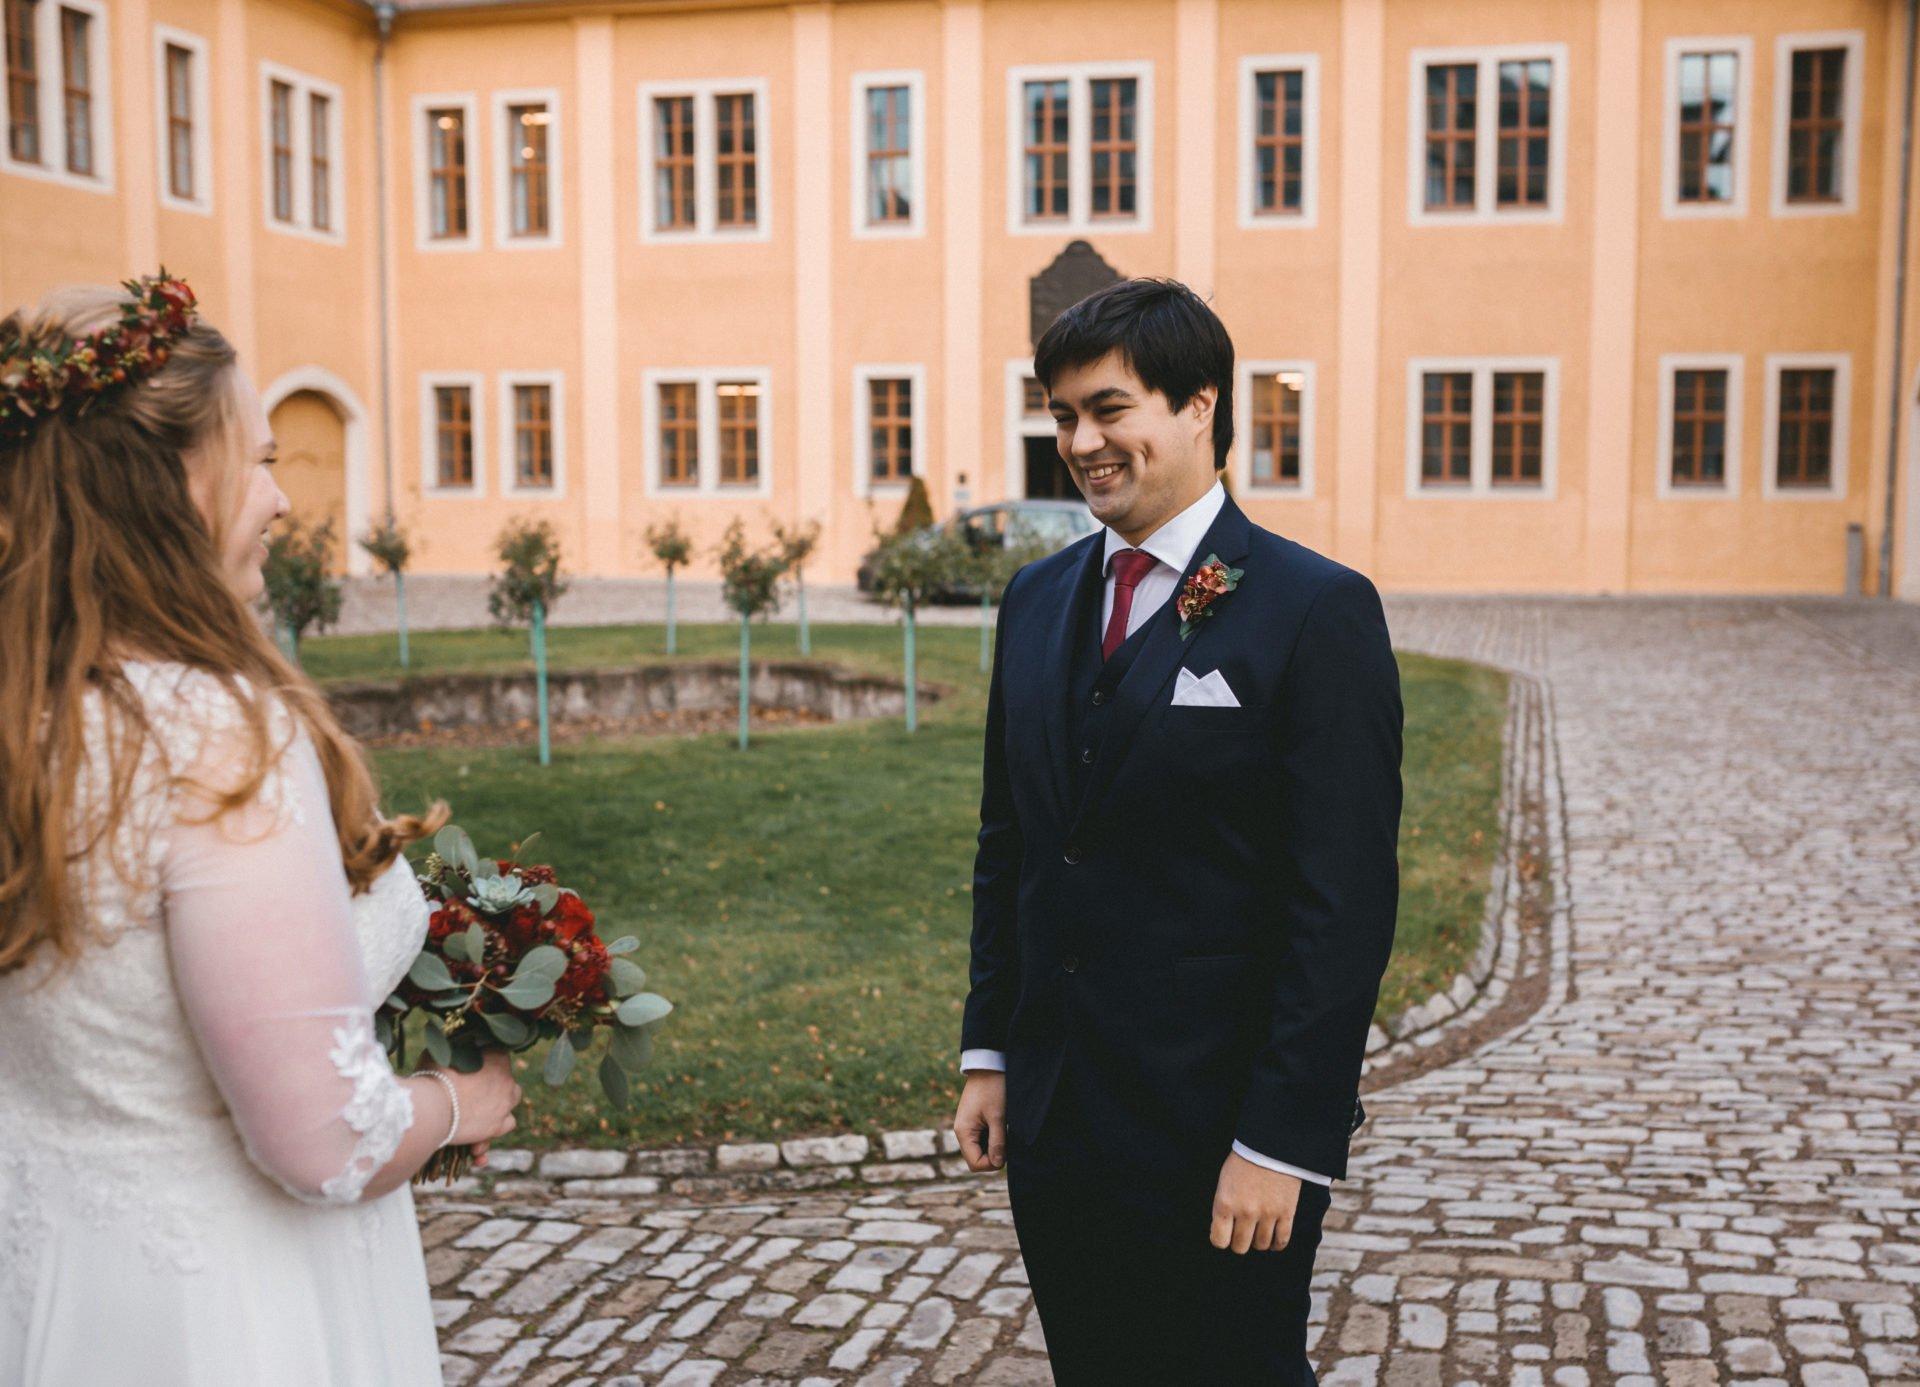 50mmfreunde Erfurt Jena Weimar Ettersburg Hochzeit 07 1920x1387 - Dezemberhochzeit im Schloss Ettersburg bei Weimar